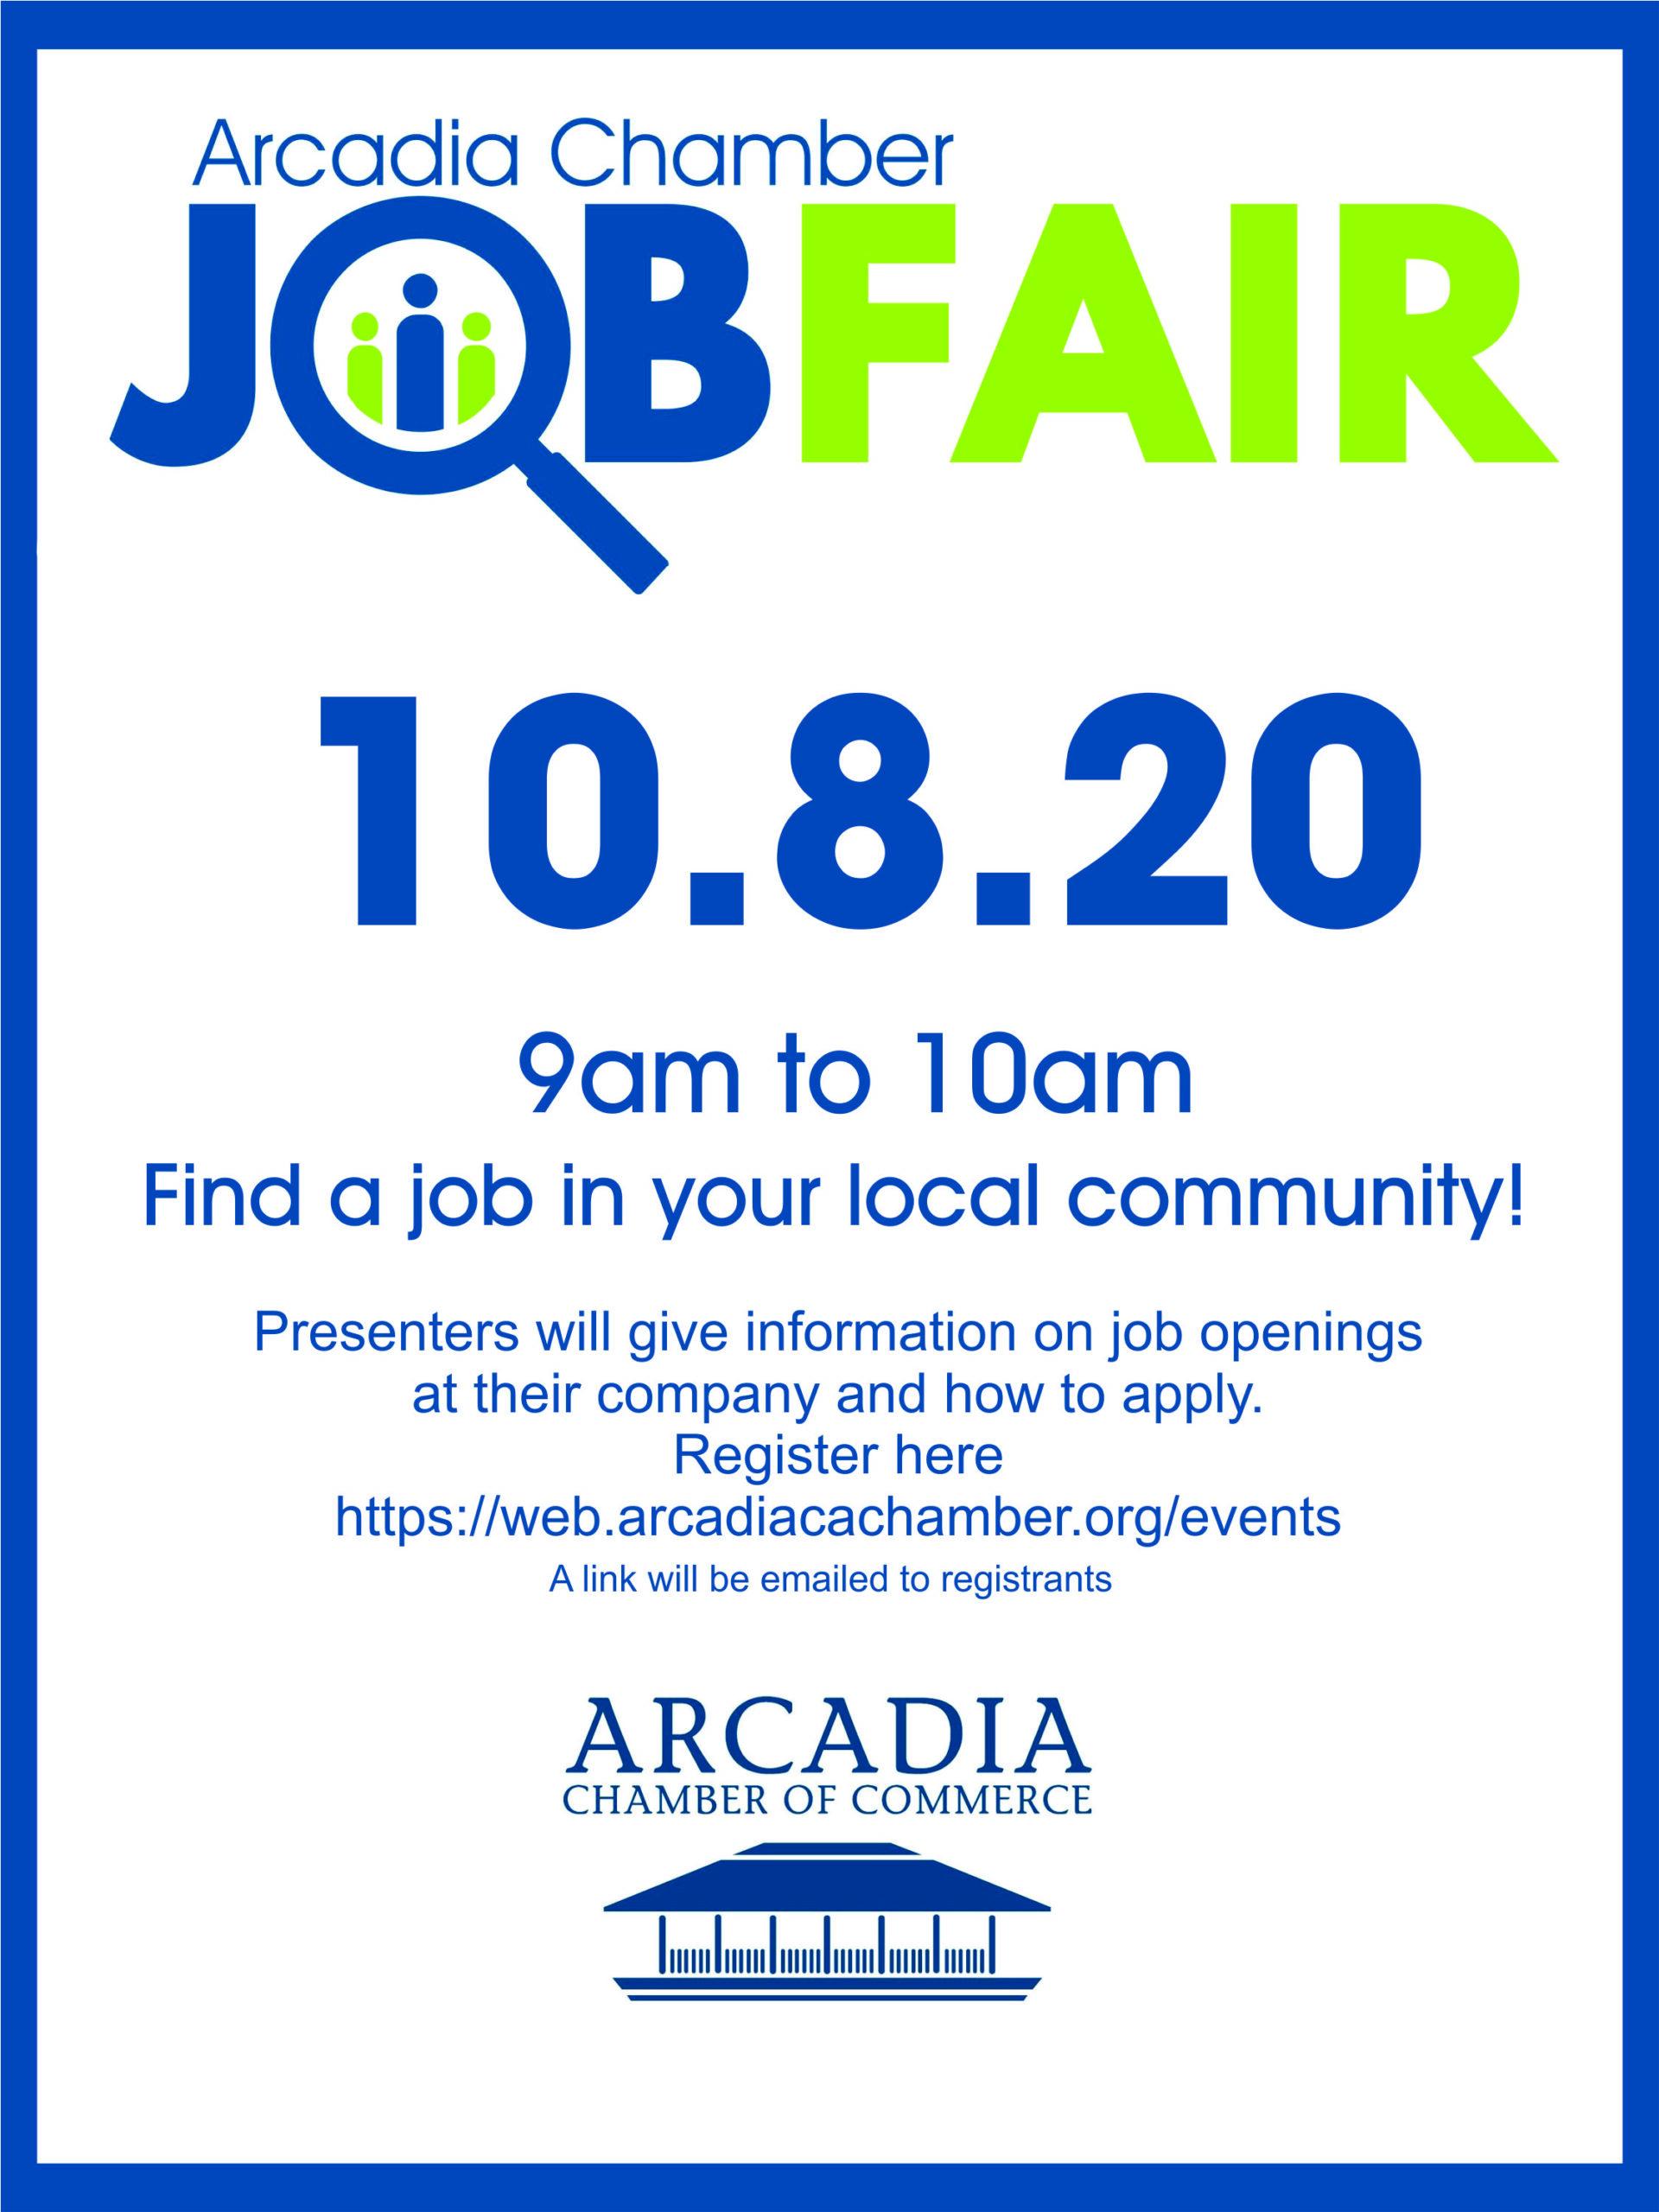 Arcadia Chamber Job Fair